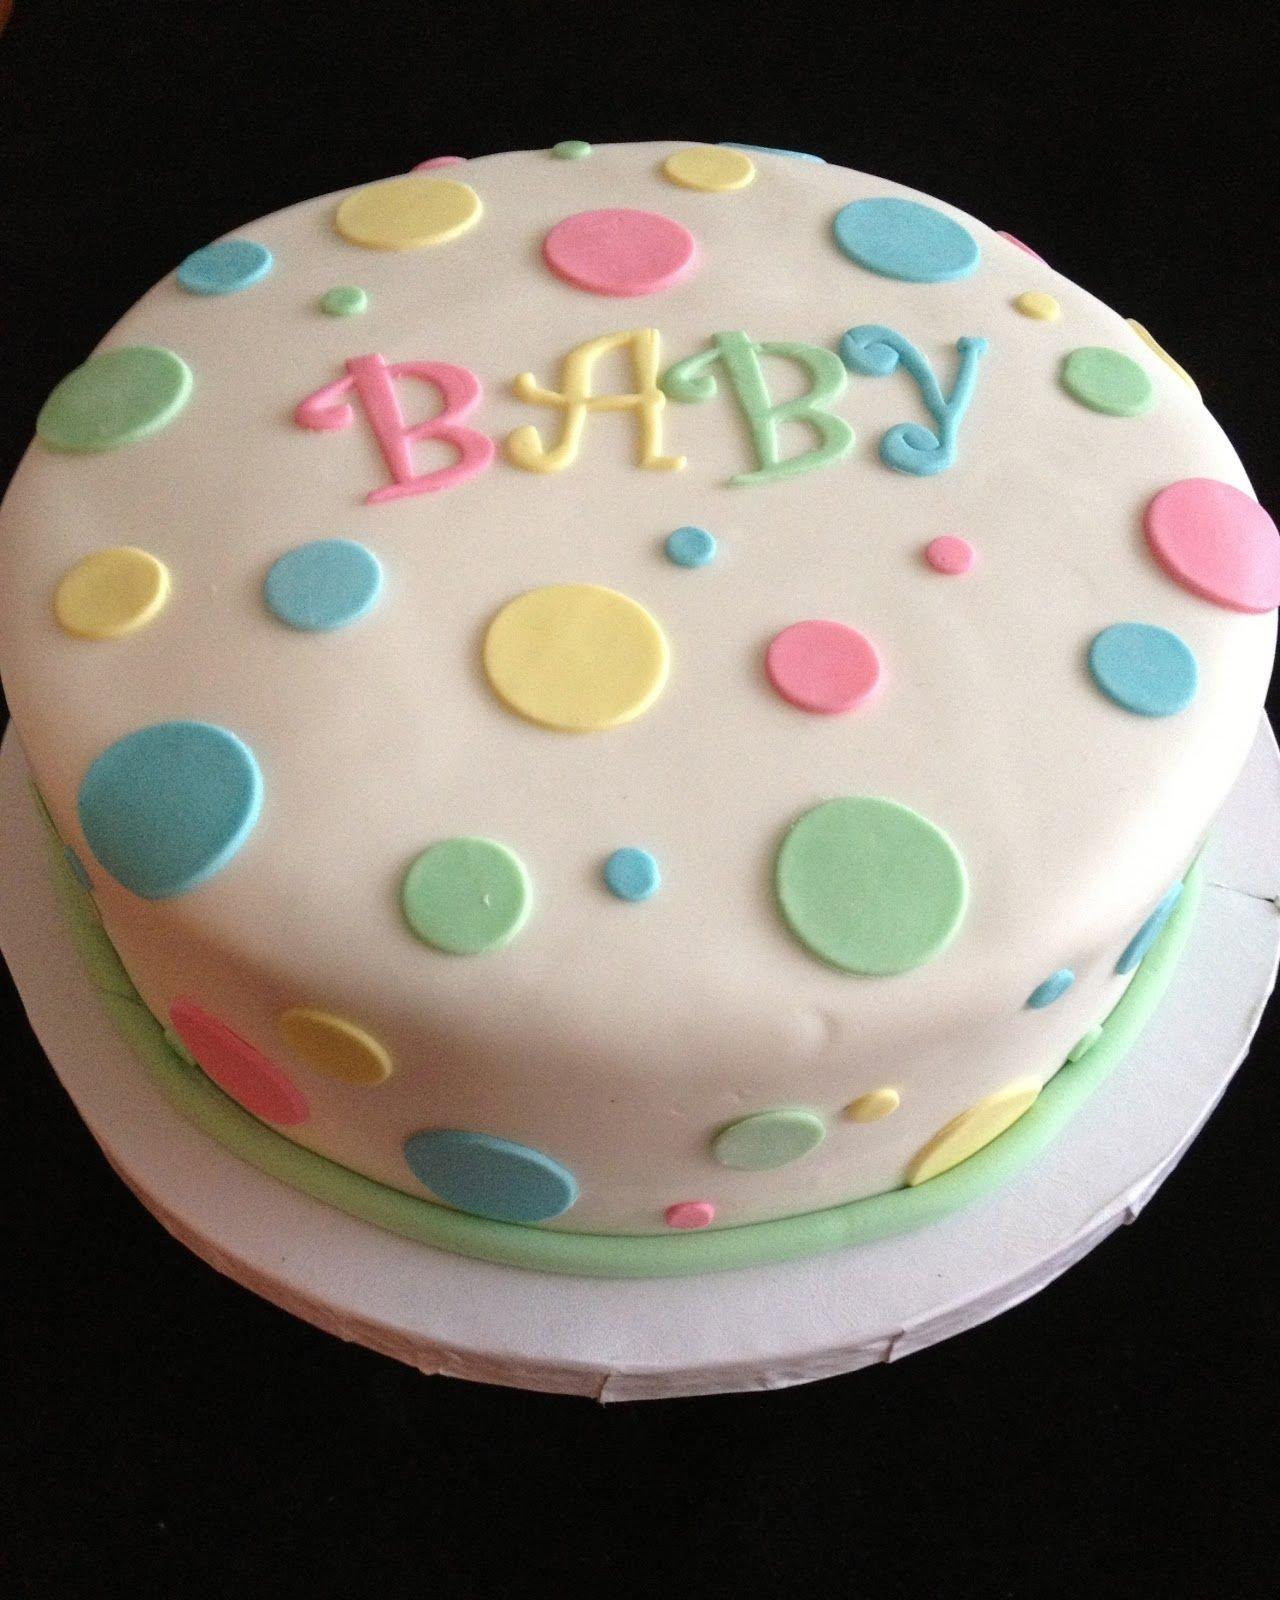 10 Elegant Cake Ideas For Baby Shower easy baby shower cake ideas unofficial shot of the cake i caught 1 2020